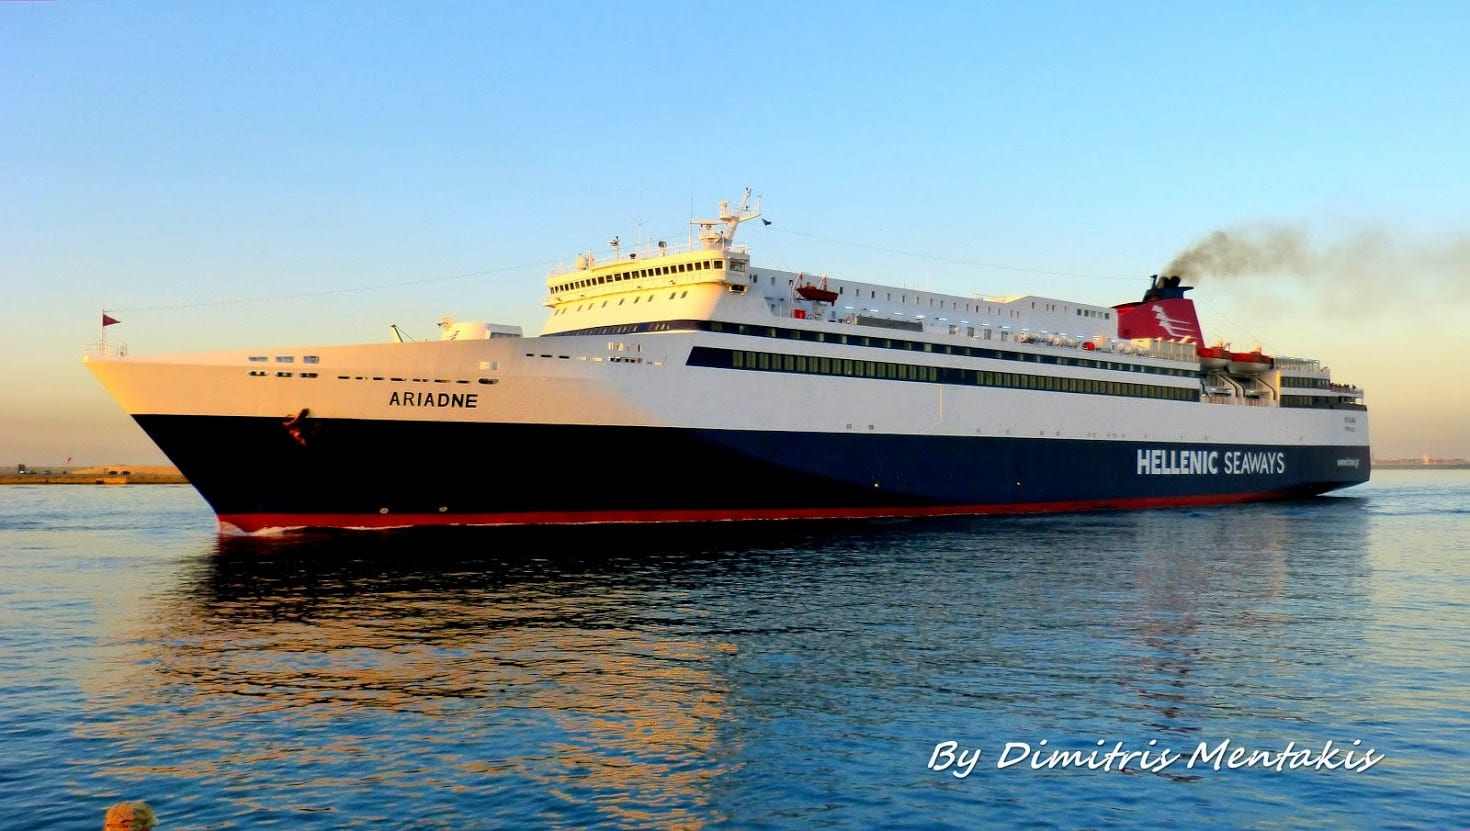 Hellenic Seaways Boat - Ariadne